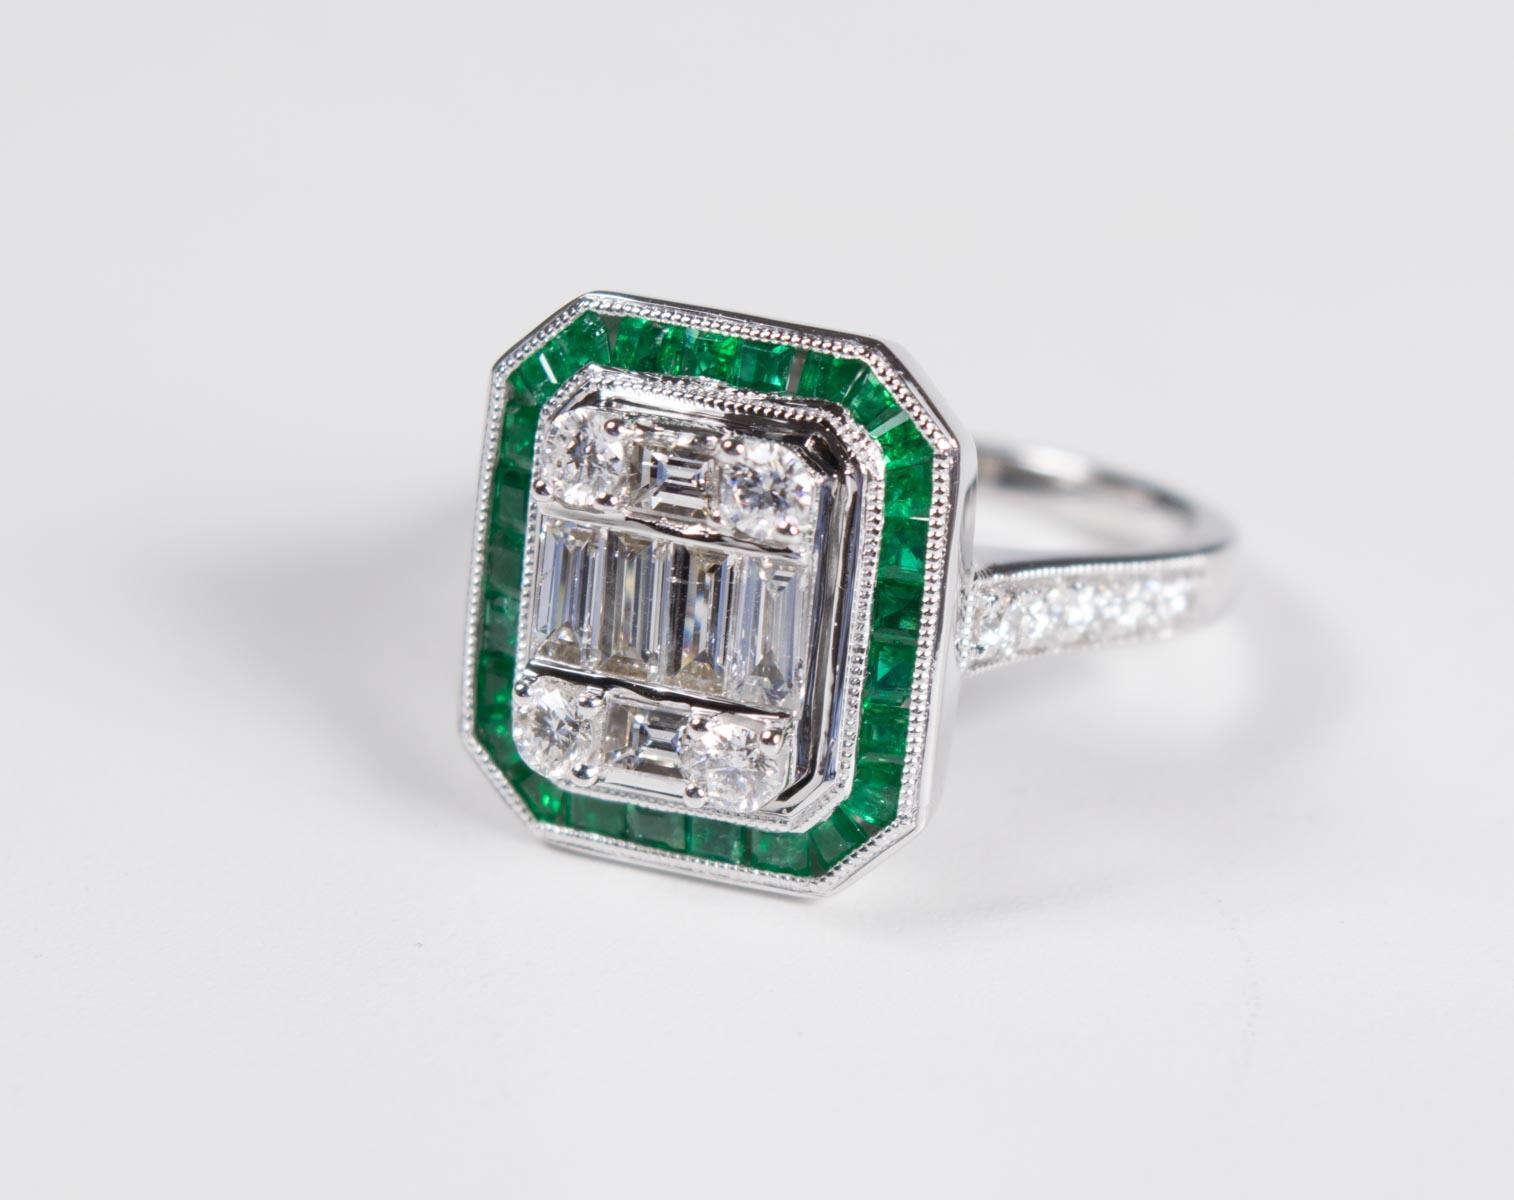 DIAMOND, EMERALD AND EIGHTEEN KARAT WHITE GOLD RIN